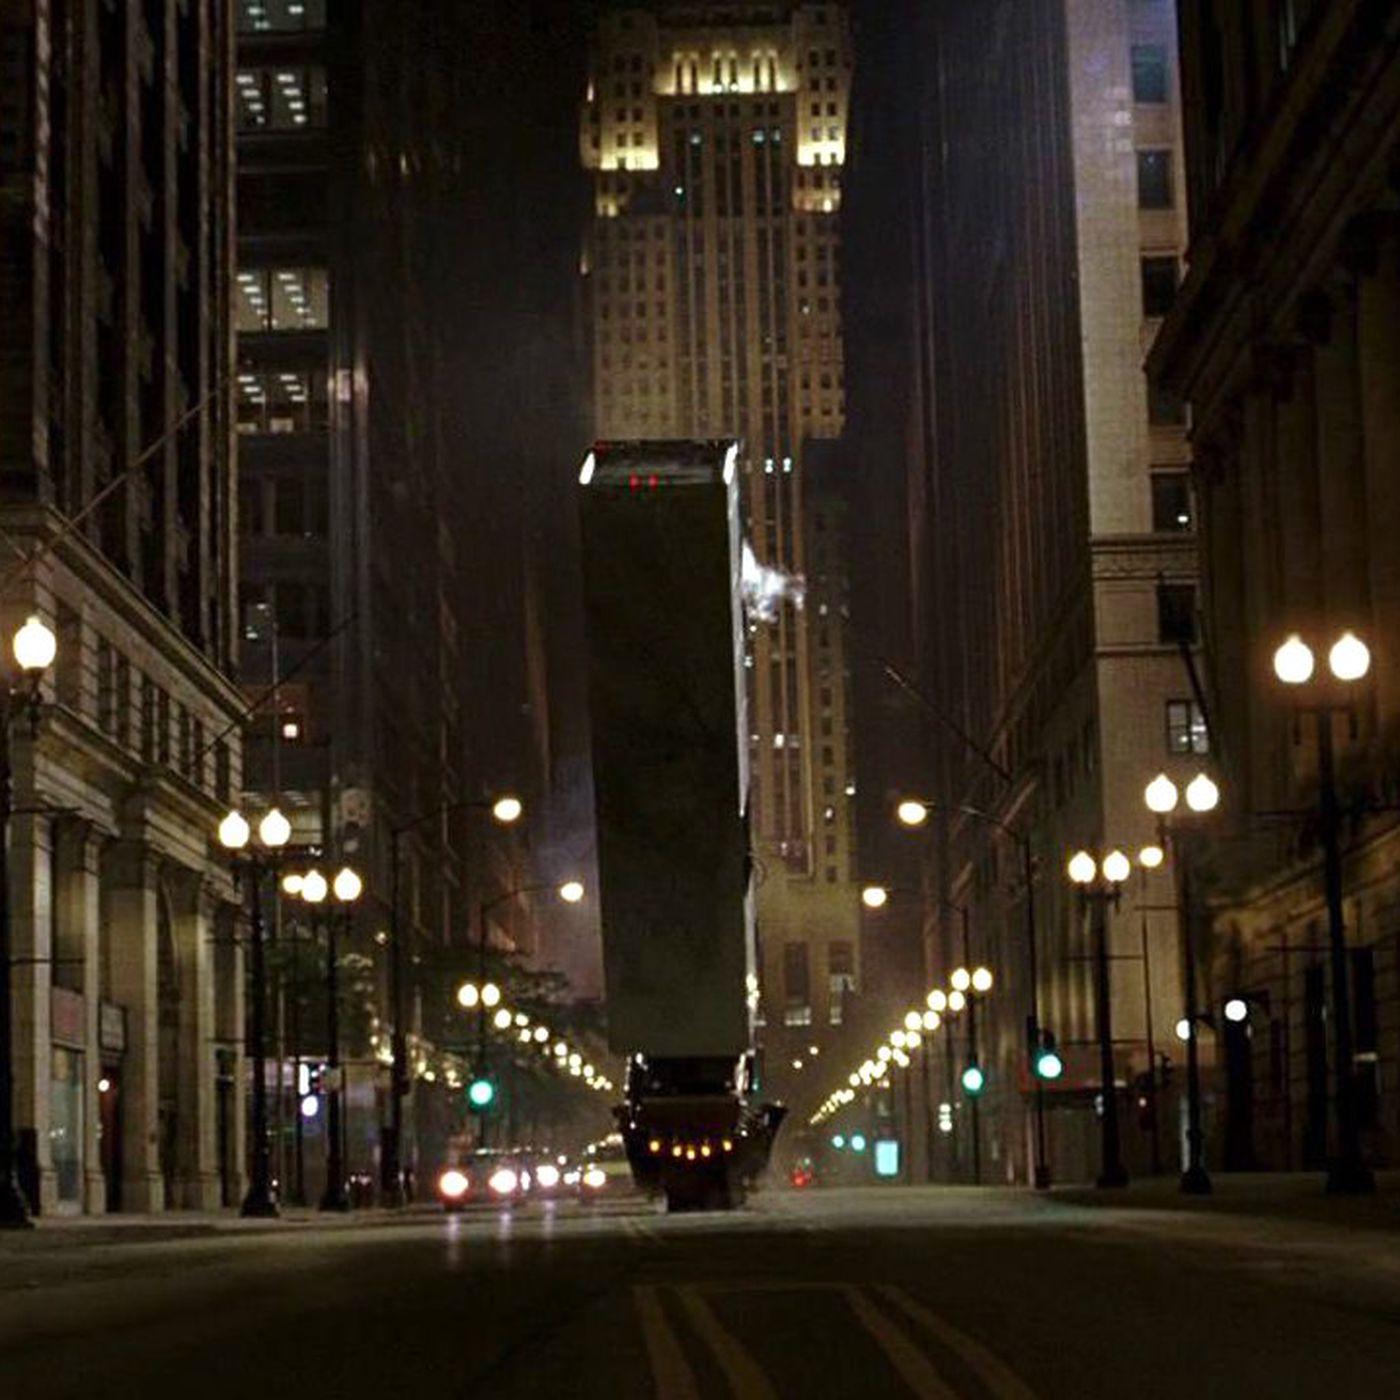 The Dark Knight truck flip: behind-the-scenes of Batman's best stunt - Polygon